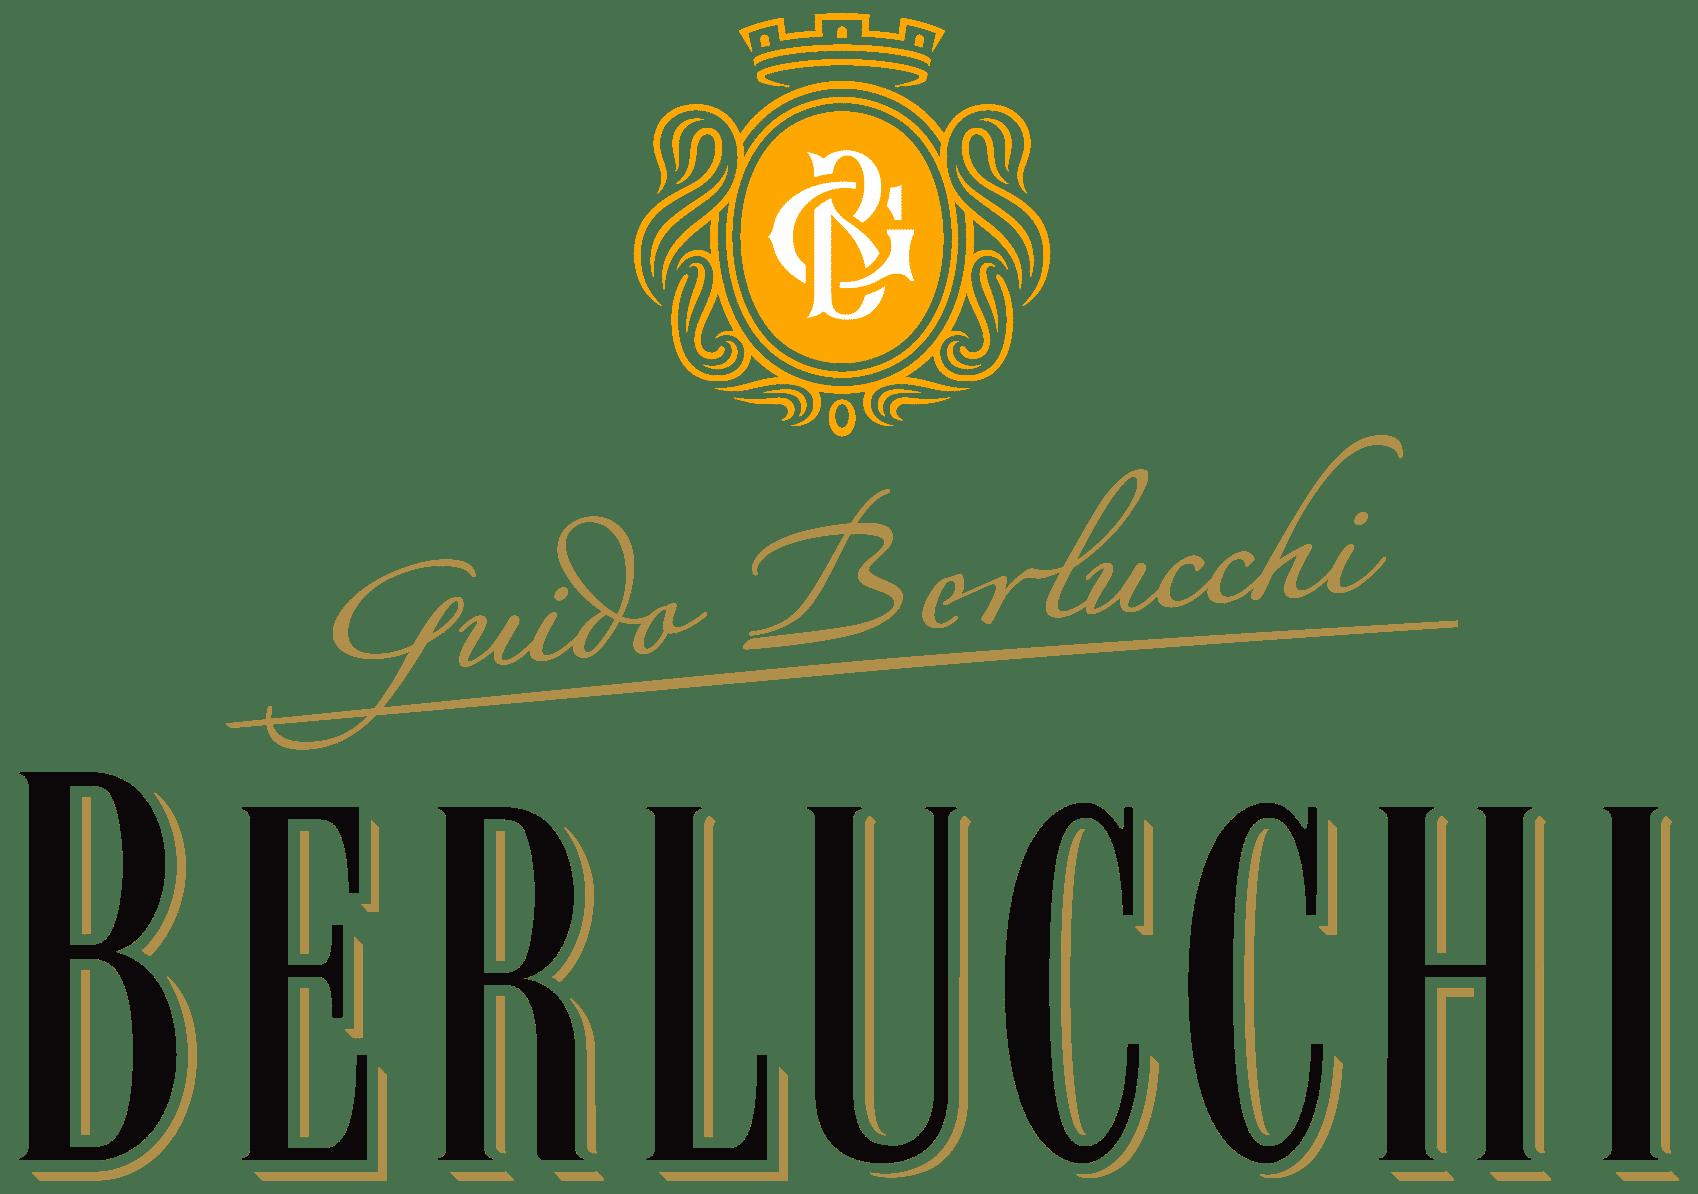 Guido Berlucchi logo